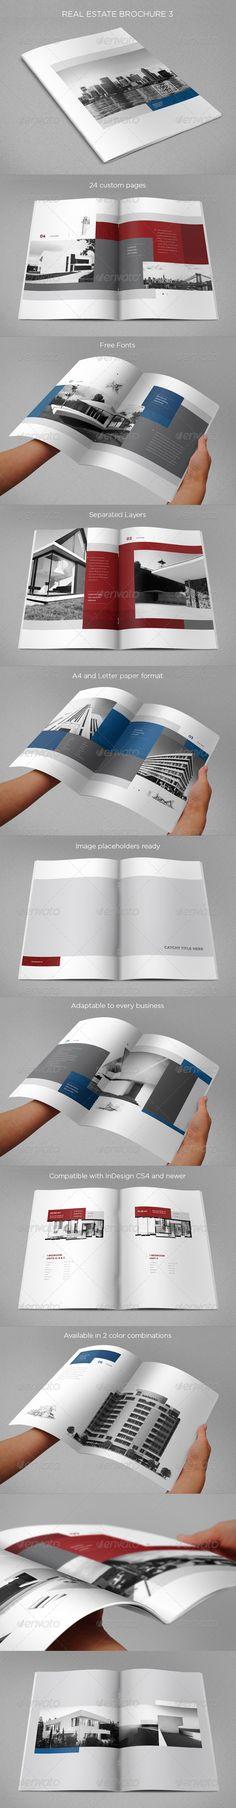 Real Estate Brochure 3 - Brochures Print Templates